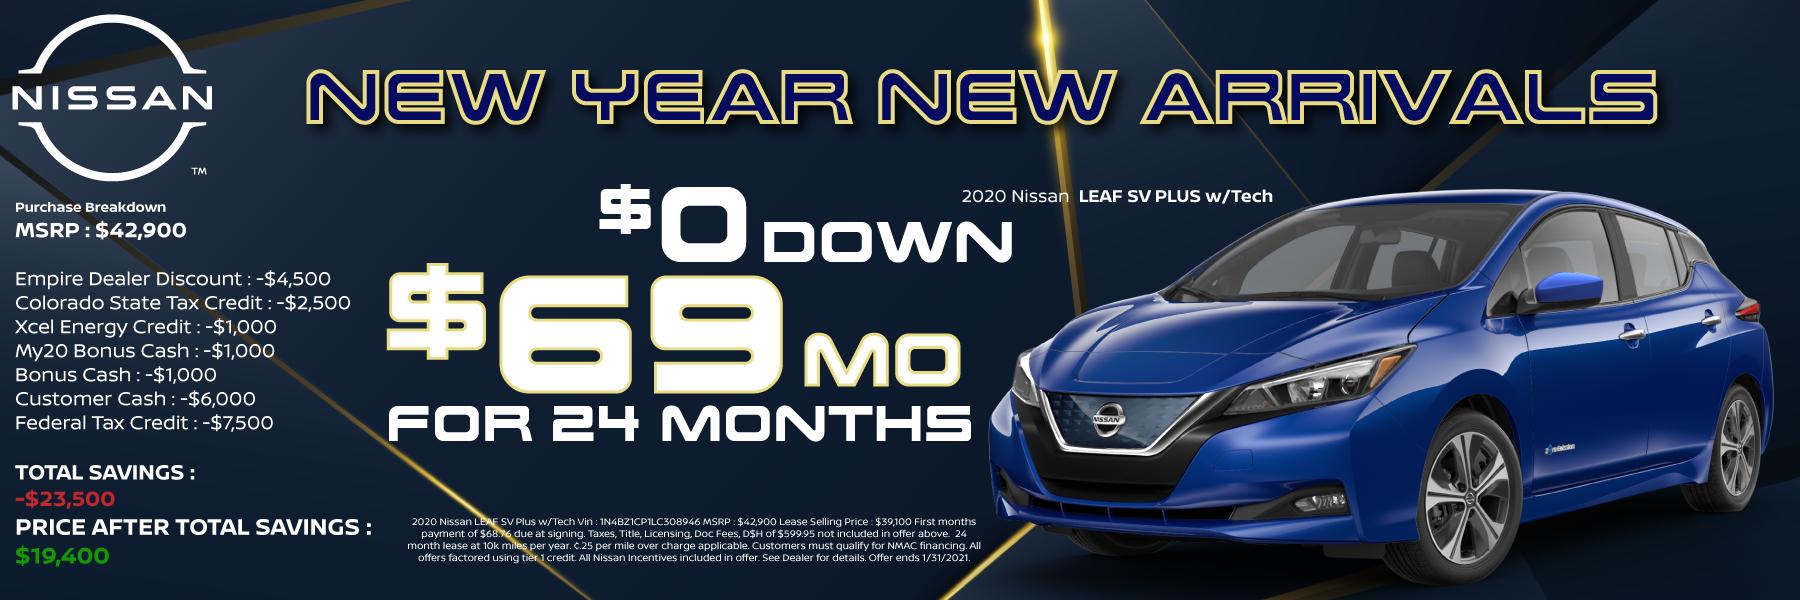 2020 Nissan LEAF SV Plus Best Specials